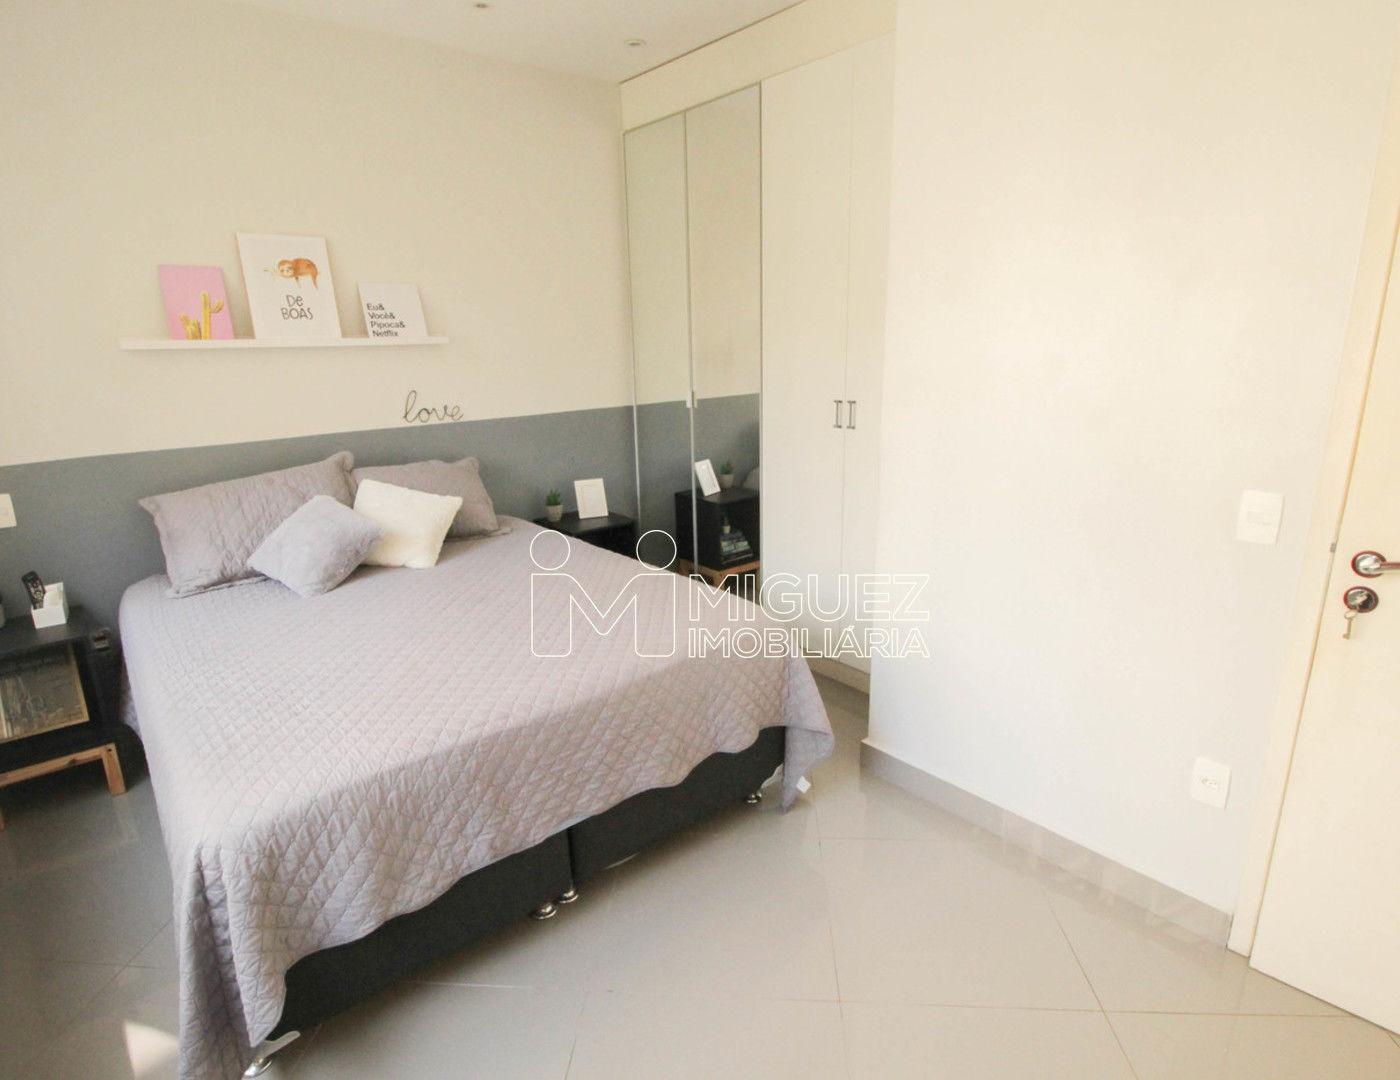 Apartamento, venda, Rua Visconde de Itamarati - Tijuca , Rio de janeiro